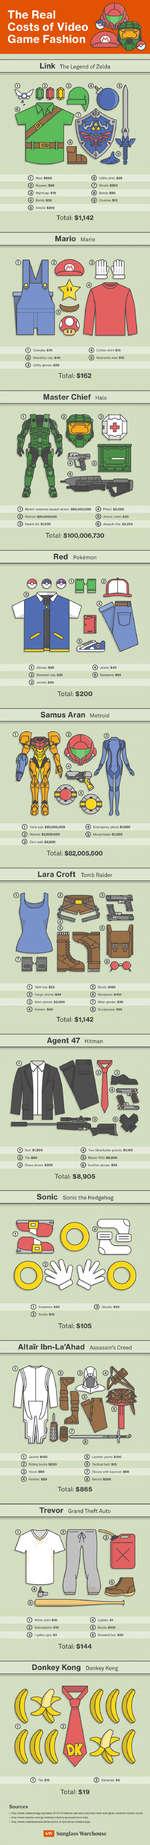 "Link The Legend of Zelda Total: $1,142 Mario Mario © МЯ@ CottttlSMrt: SIS ©N,.,»o»c."":,43© Mu""acb.w«:S12 © ............... Total: $162 Master Chief Halo © Helmet 820,000,000 © .............. ©«*«« © Ammo crate. © Aesaull rifle, Total: $100,006,730 Red Pokemon ©Glee* ,20© Jeans, S40"